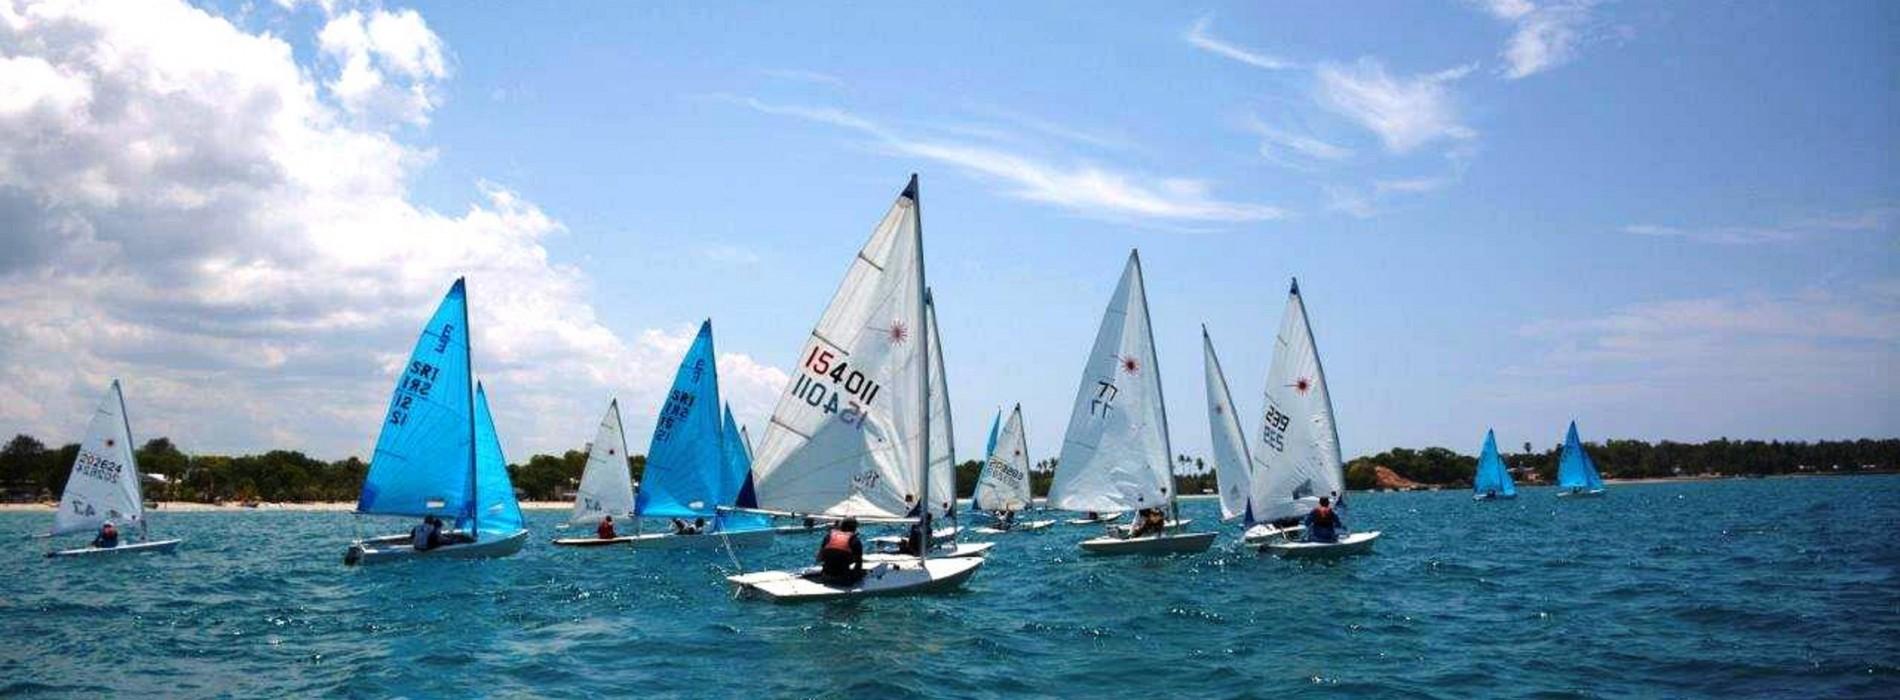 Trinco Blu by Cinnamon hosted the annual Sailing Regatta for the 9th consecutive year